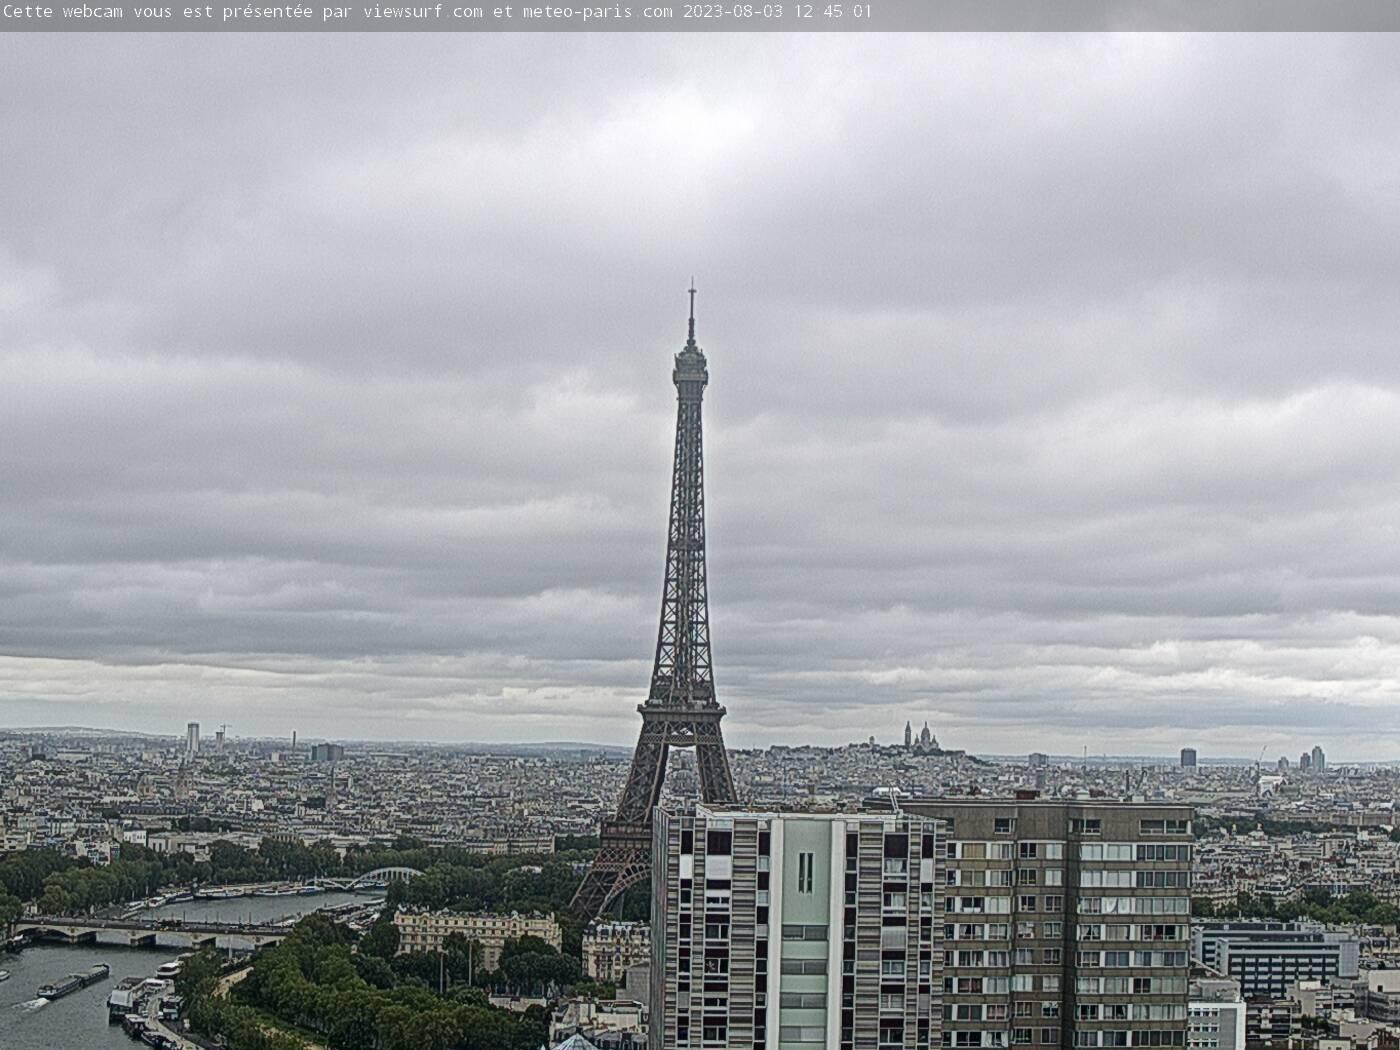 Paris Webcam